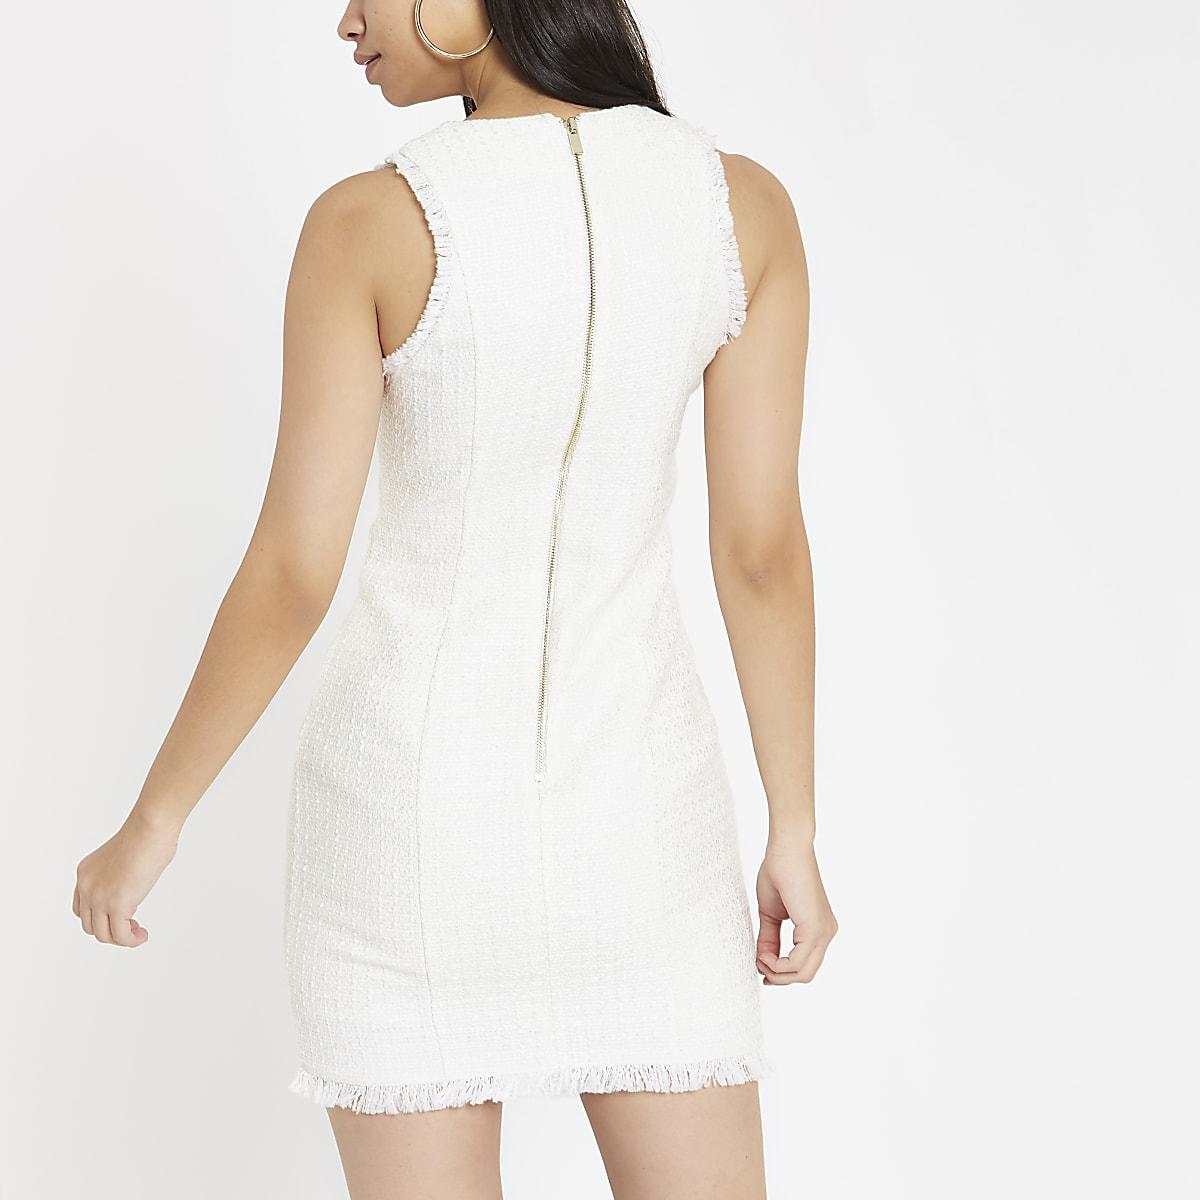 68c62ae0cfe White boucle mini bodycon dress - Bodycon Dresses - Dresses - women